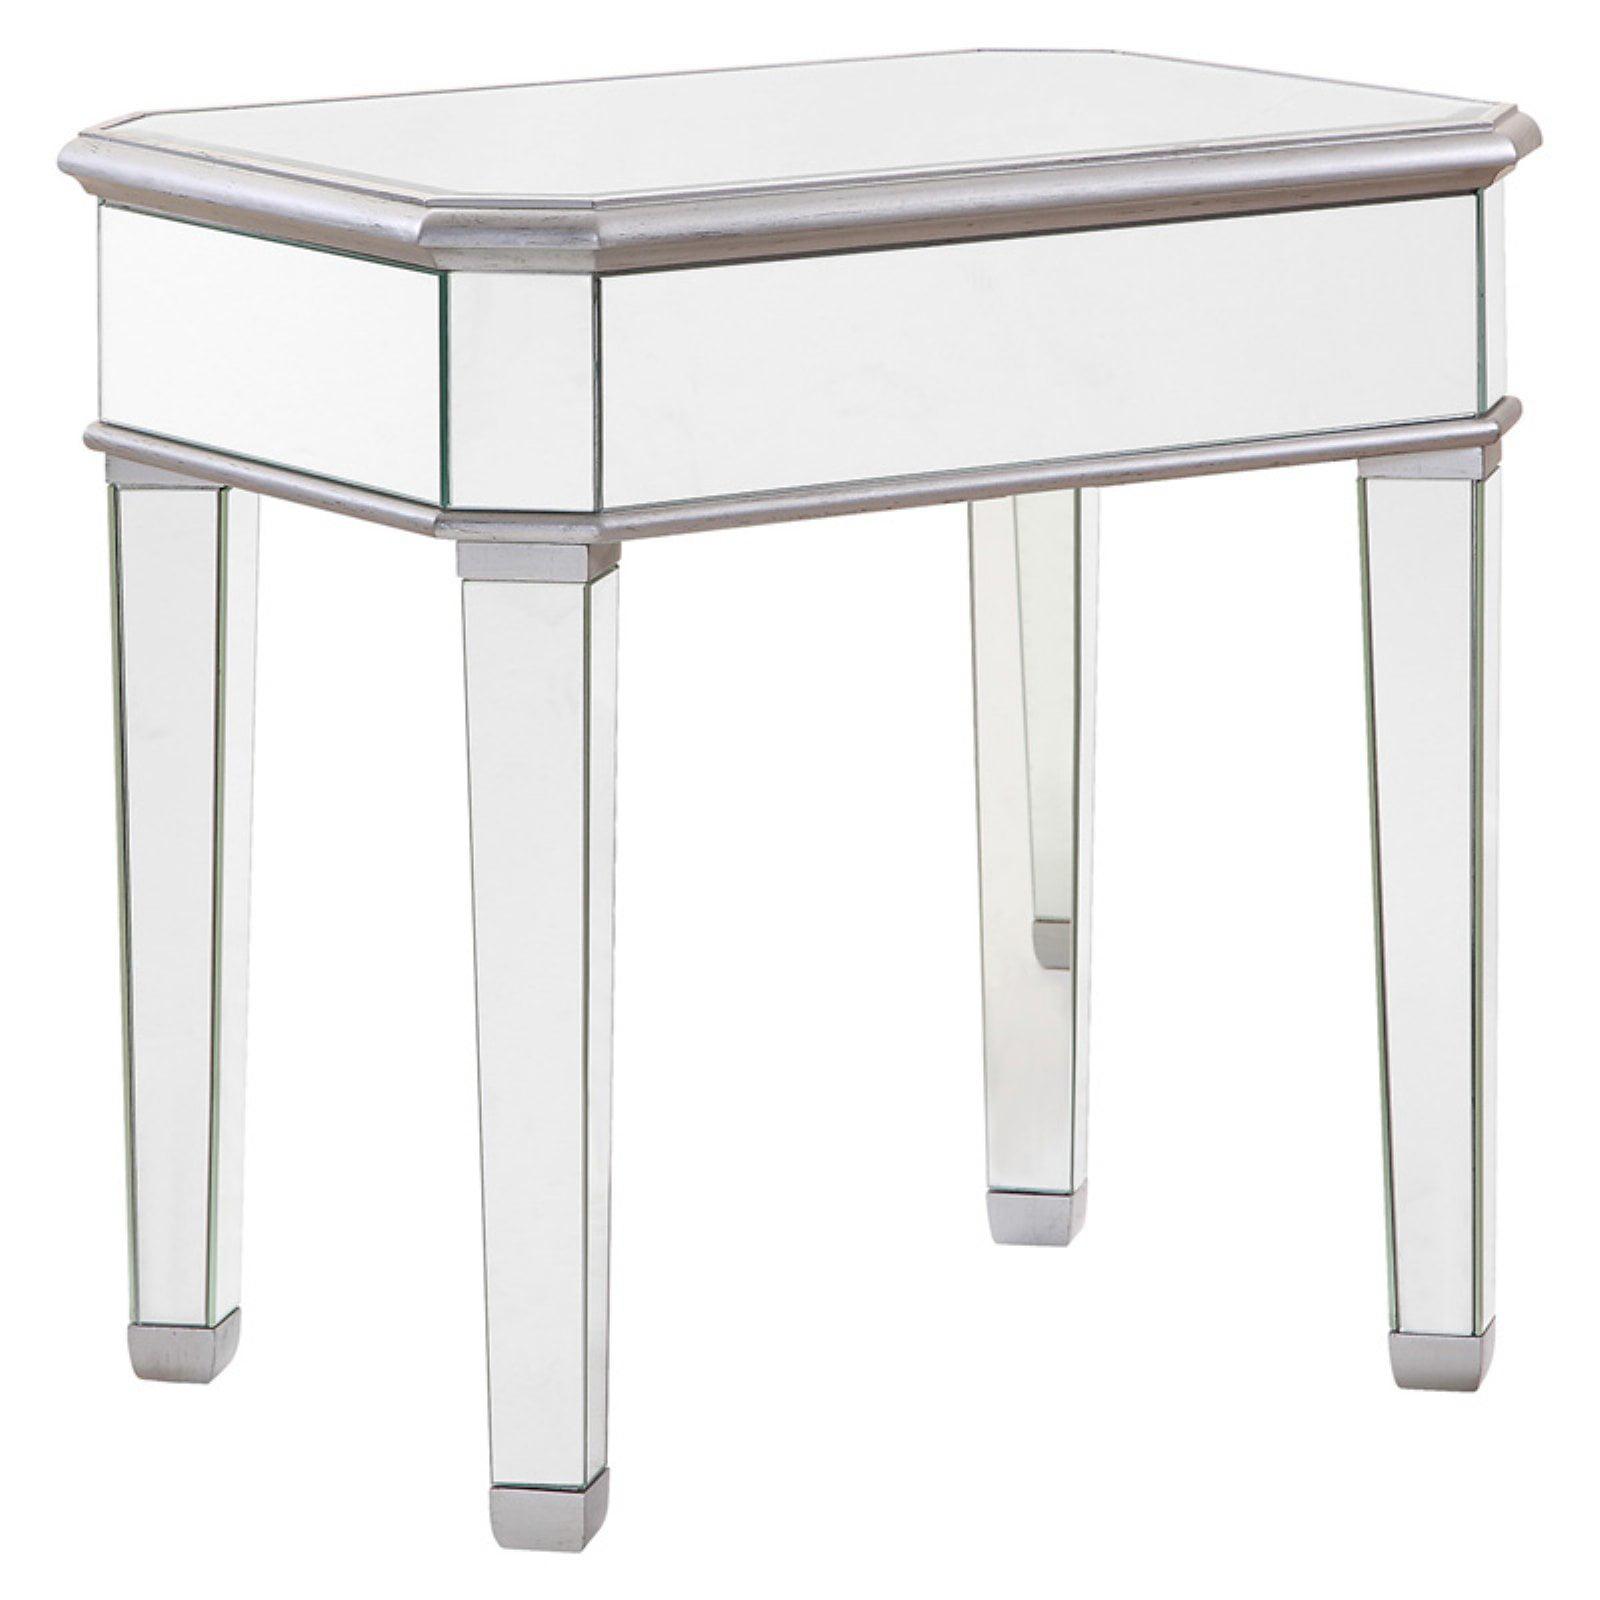 Click here to buy Elegant Lighting Mirrored Lamp Table, Silver by Elegant Lighting.